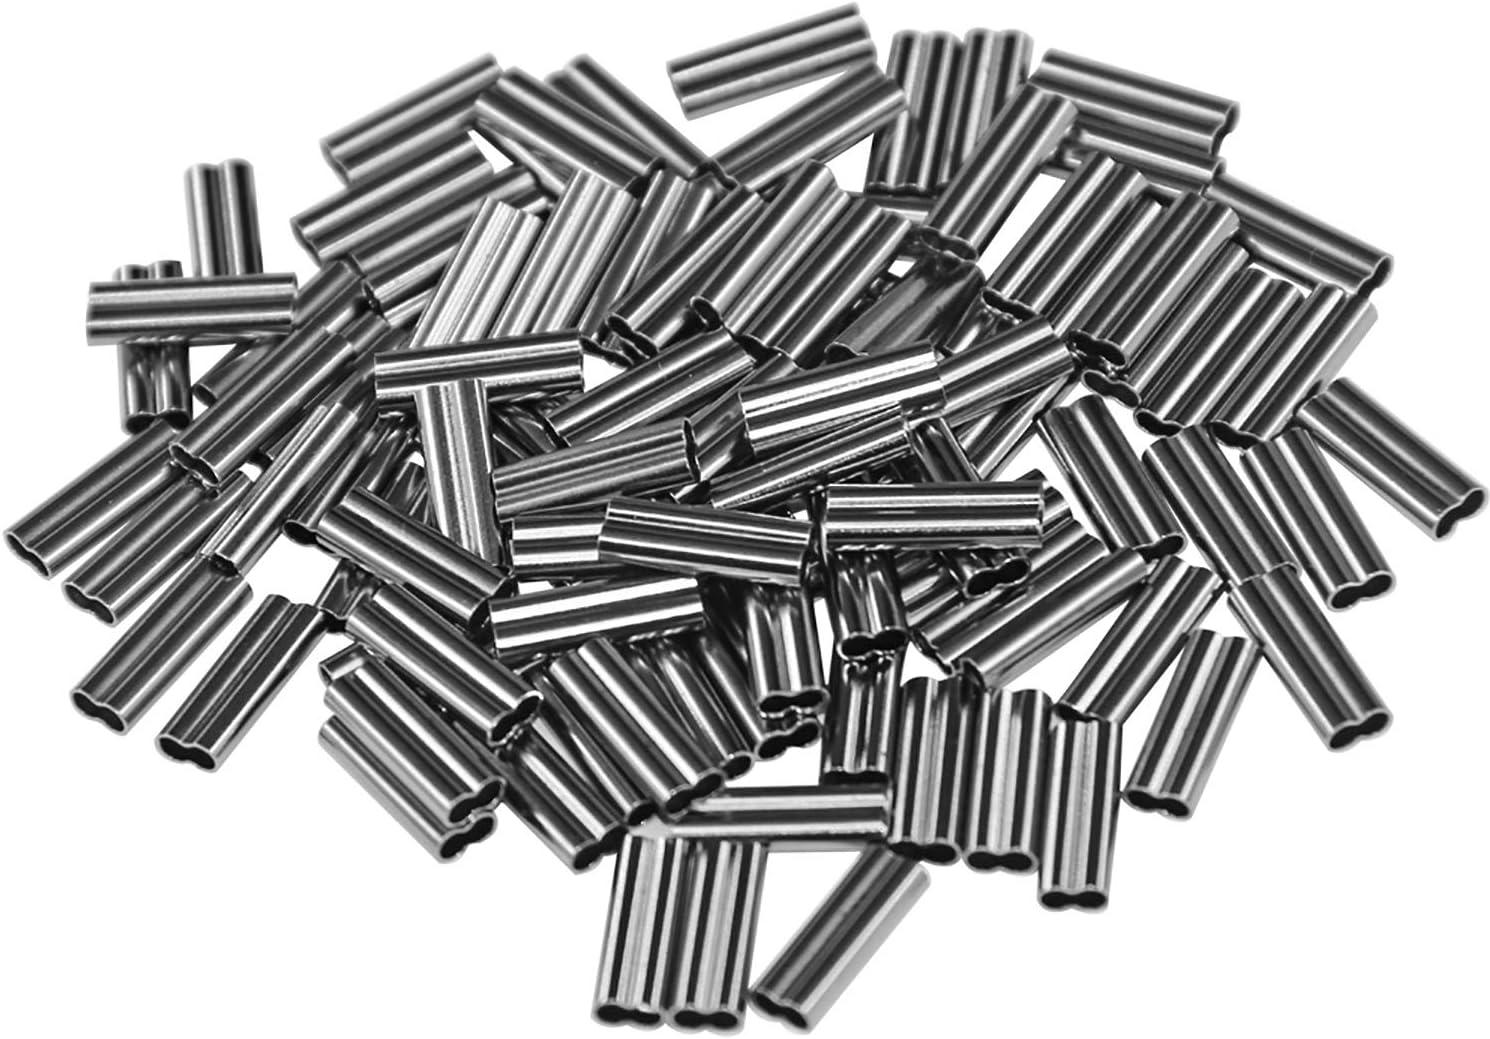 Shaddock Angeln Double Barrel Crimping Sleeves 100stk Angeln Draht /Ärmel Angelschnur Tube Leader Sleeves Kupferrohr-Anschluss Angelger/ät Kit